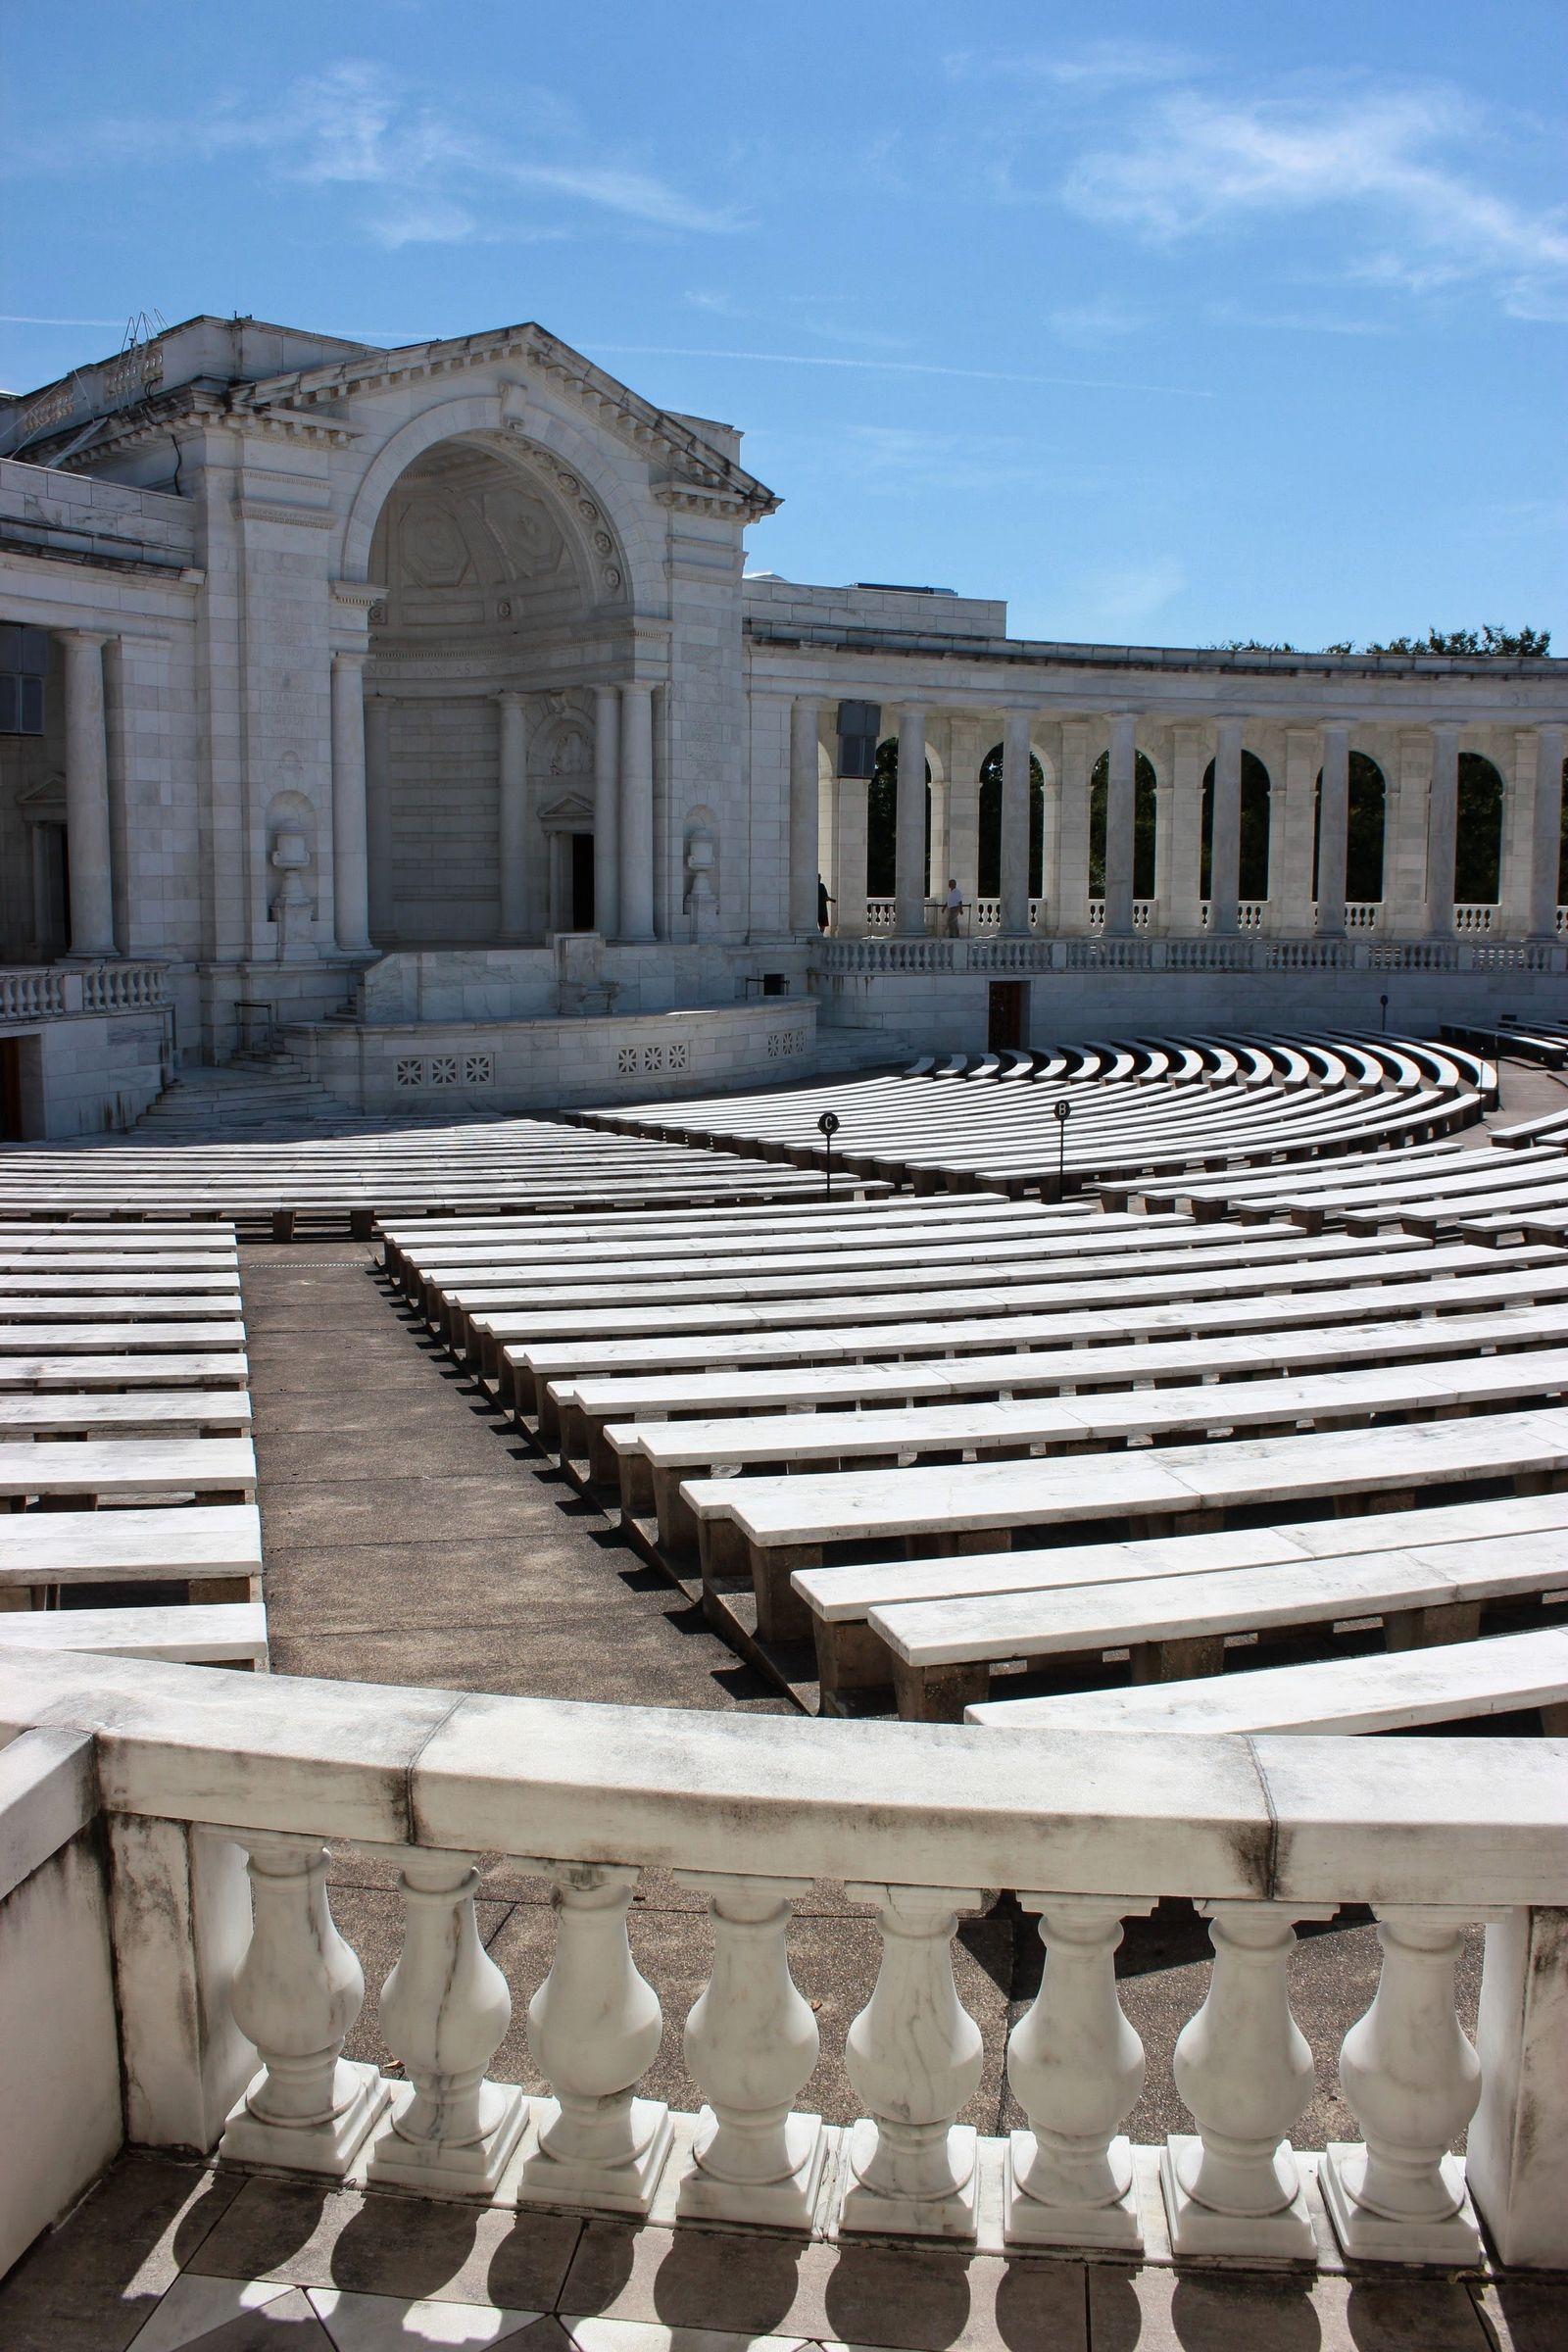 Memorial Amphiteater, escenario de ceremonias